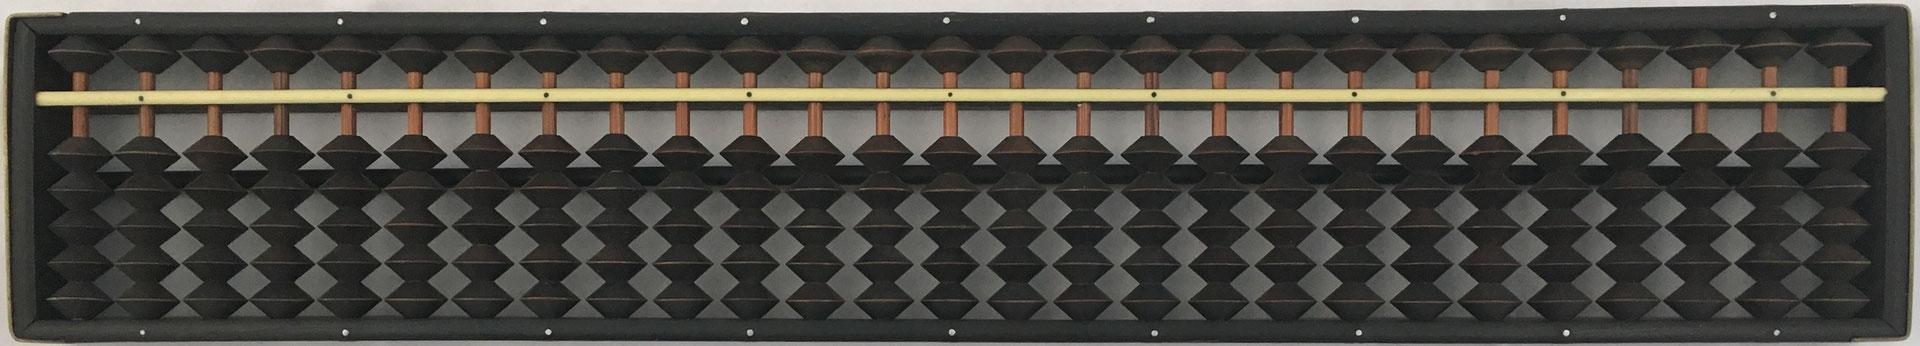 "Ábaco japonés ""soroban"" anterior a la II Guerra Mundial, 27 columnas, 39x7 cm"